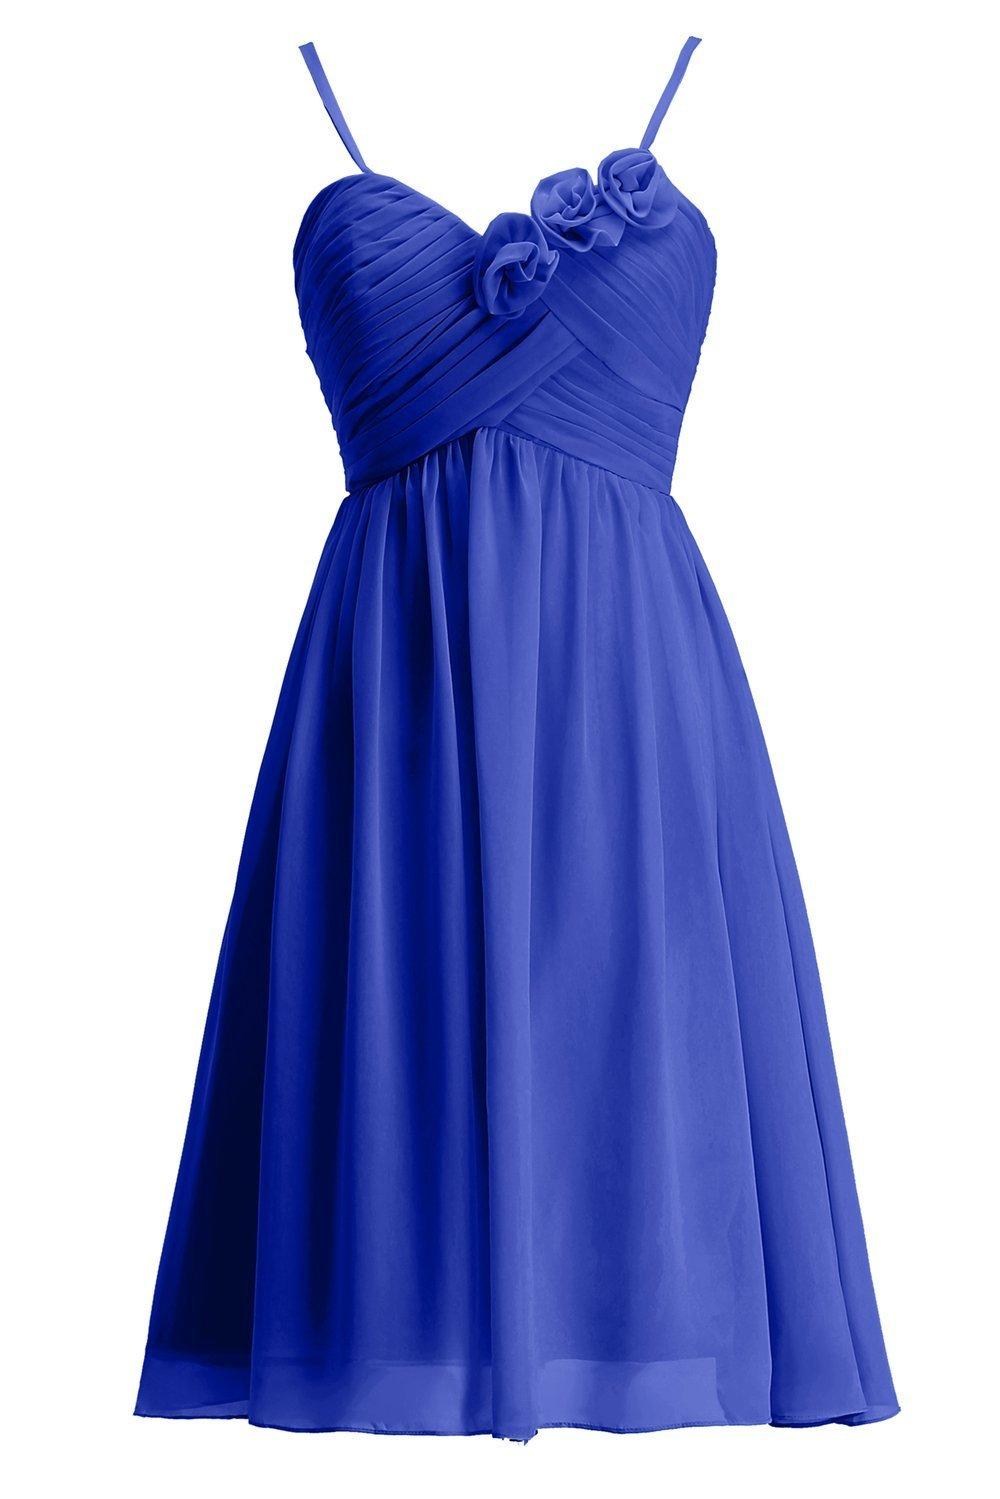 Miranda's Bridal Women's Spaghetti Strap Pleated Chiffon Short Mini Bridesmaid Dress Royal Blue US6